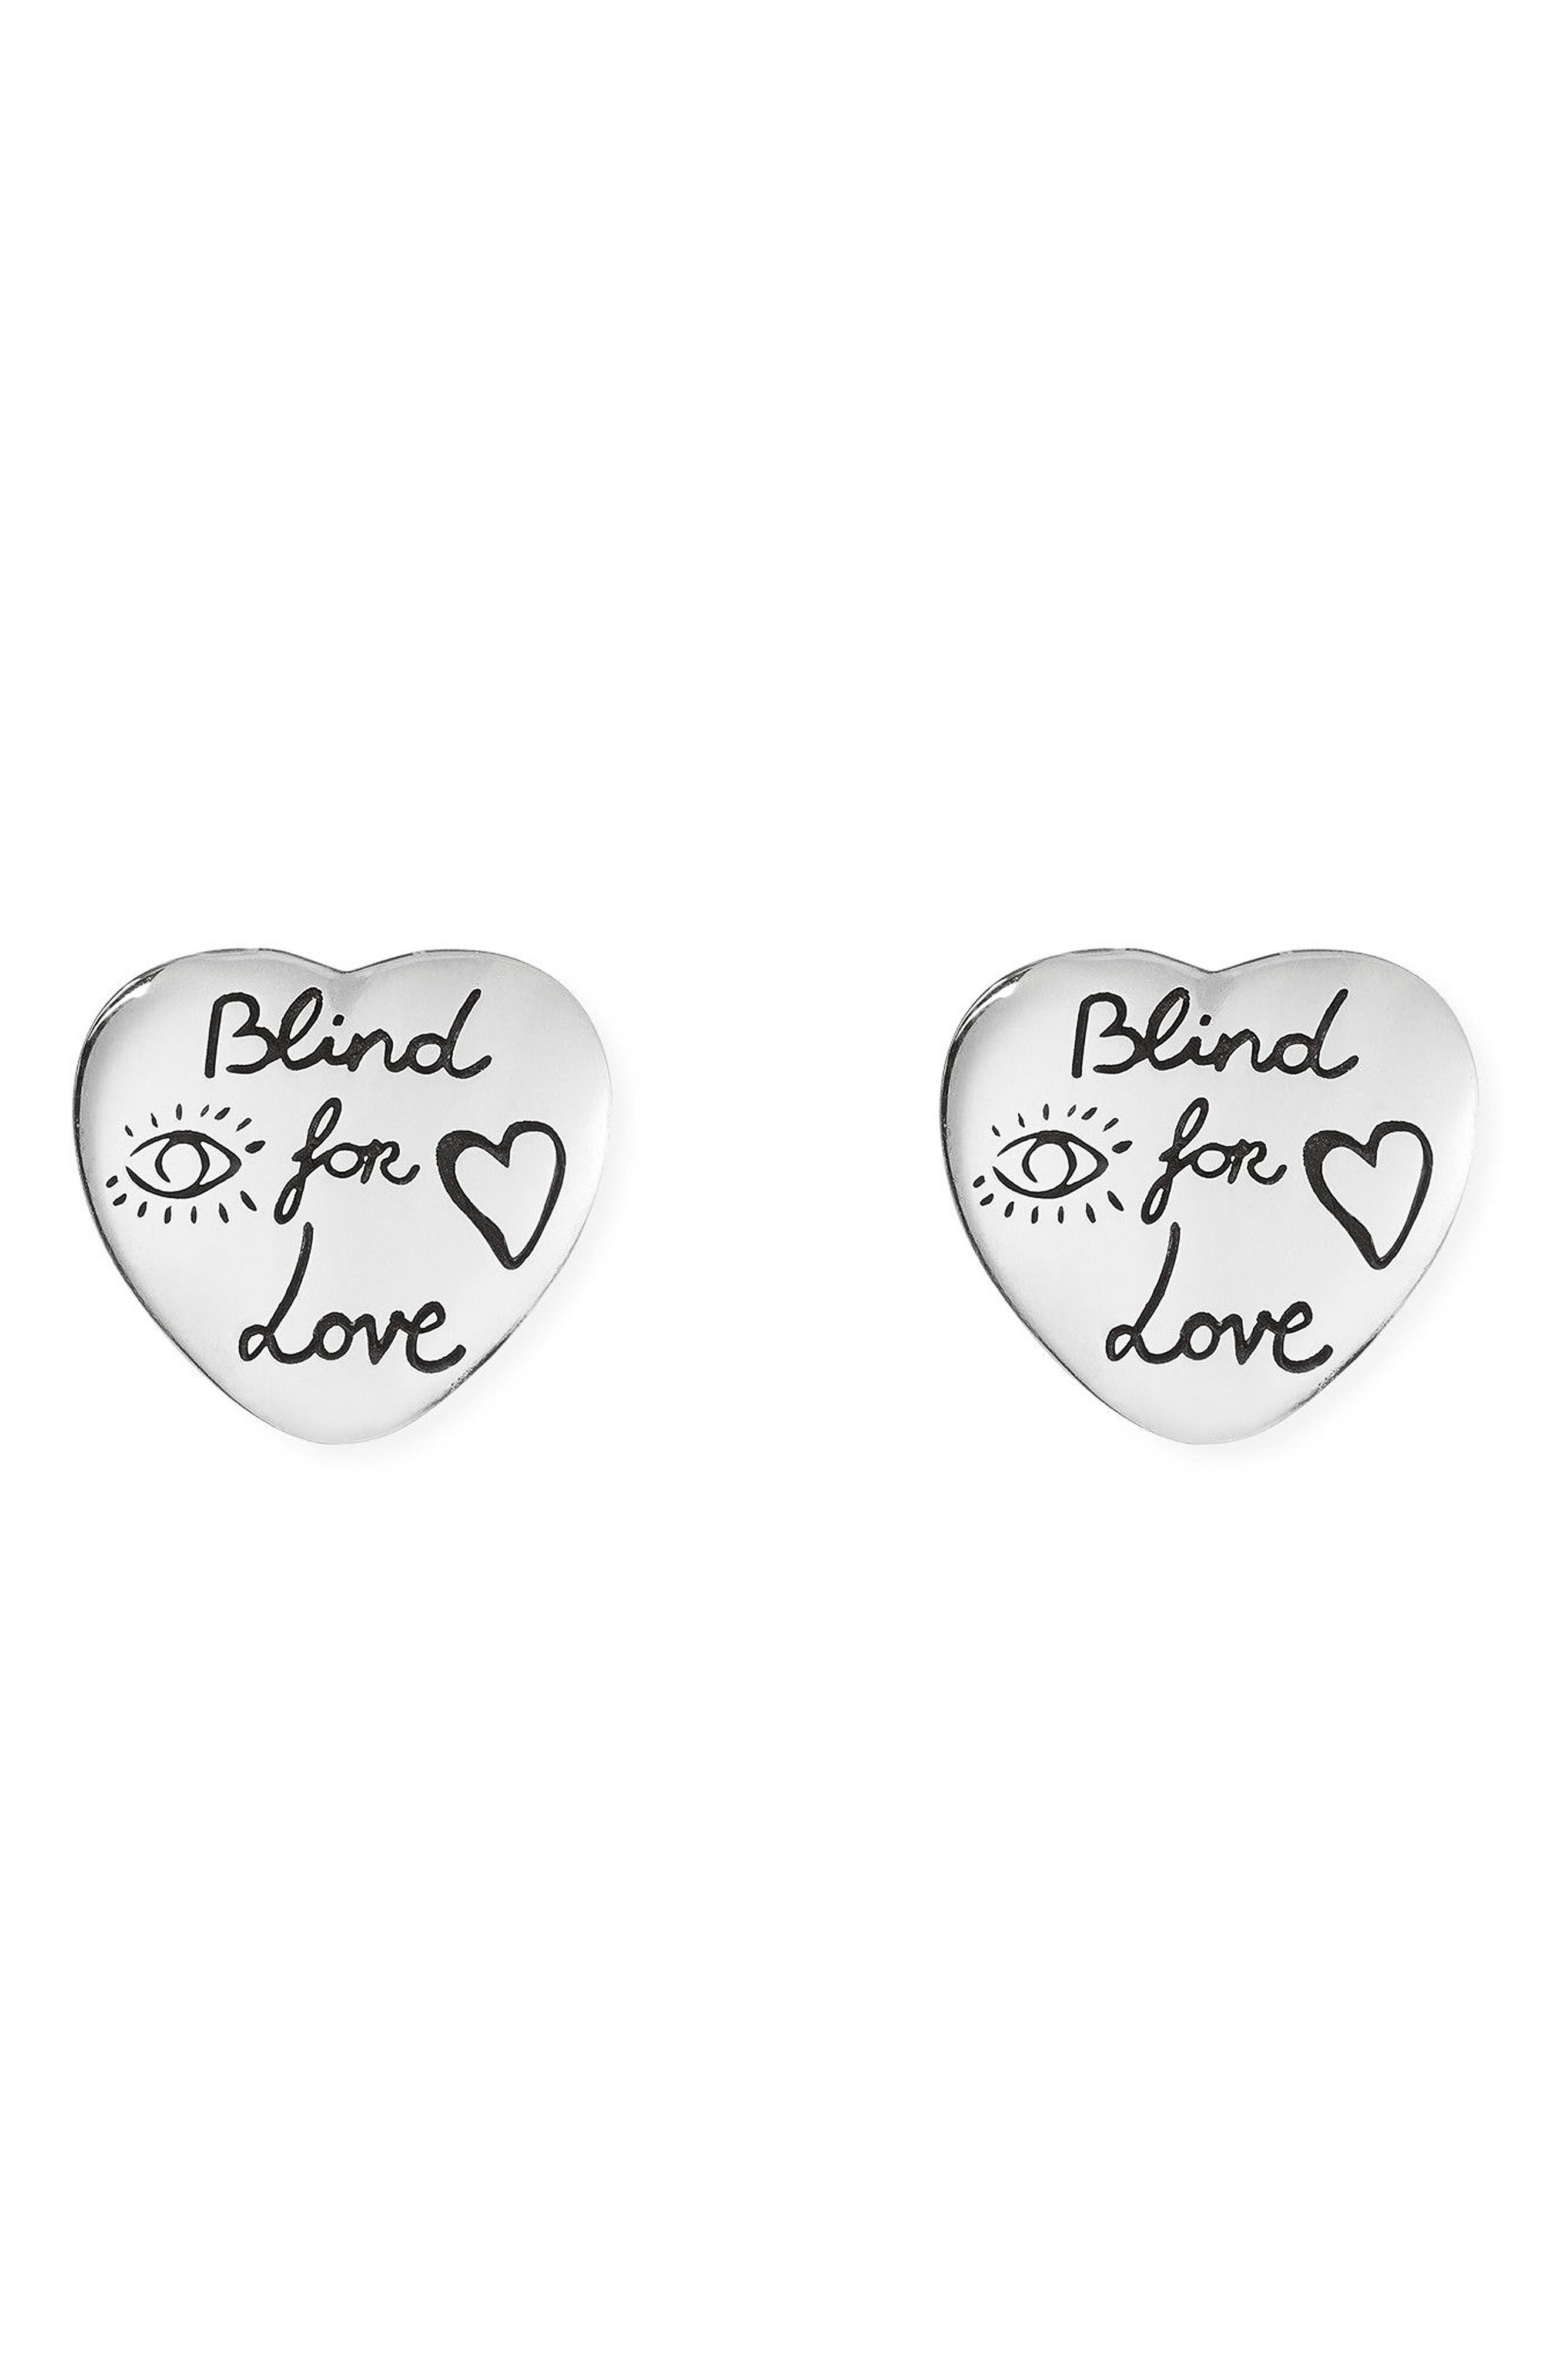 Blind for Love Stud Earrings,                             Main thumbnail 1, color,                             Sterling Silver